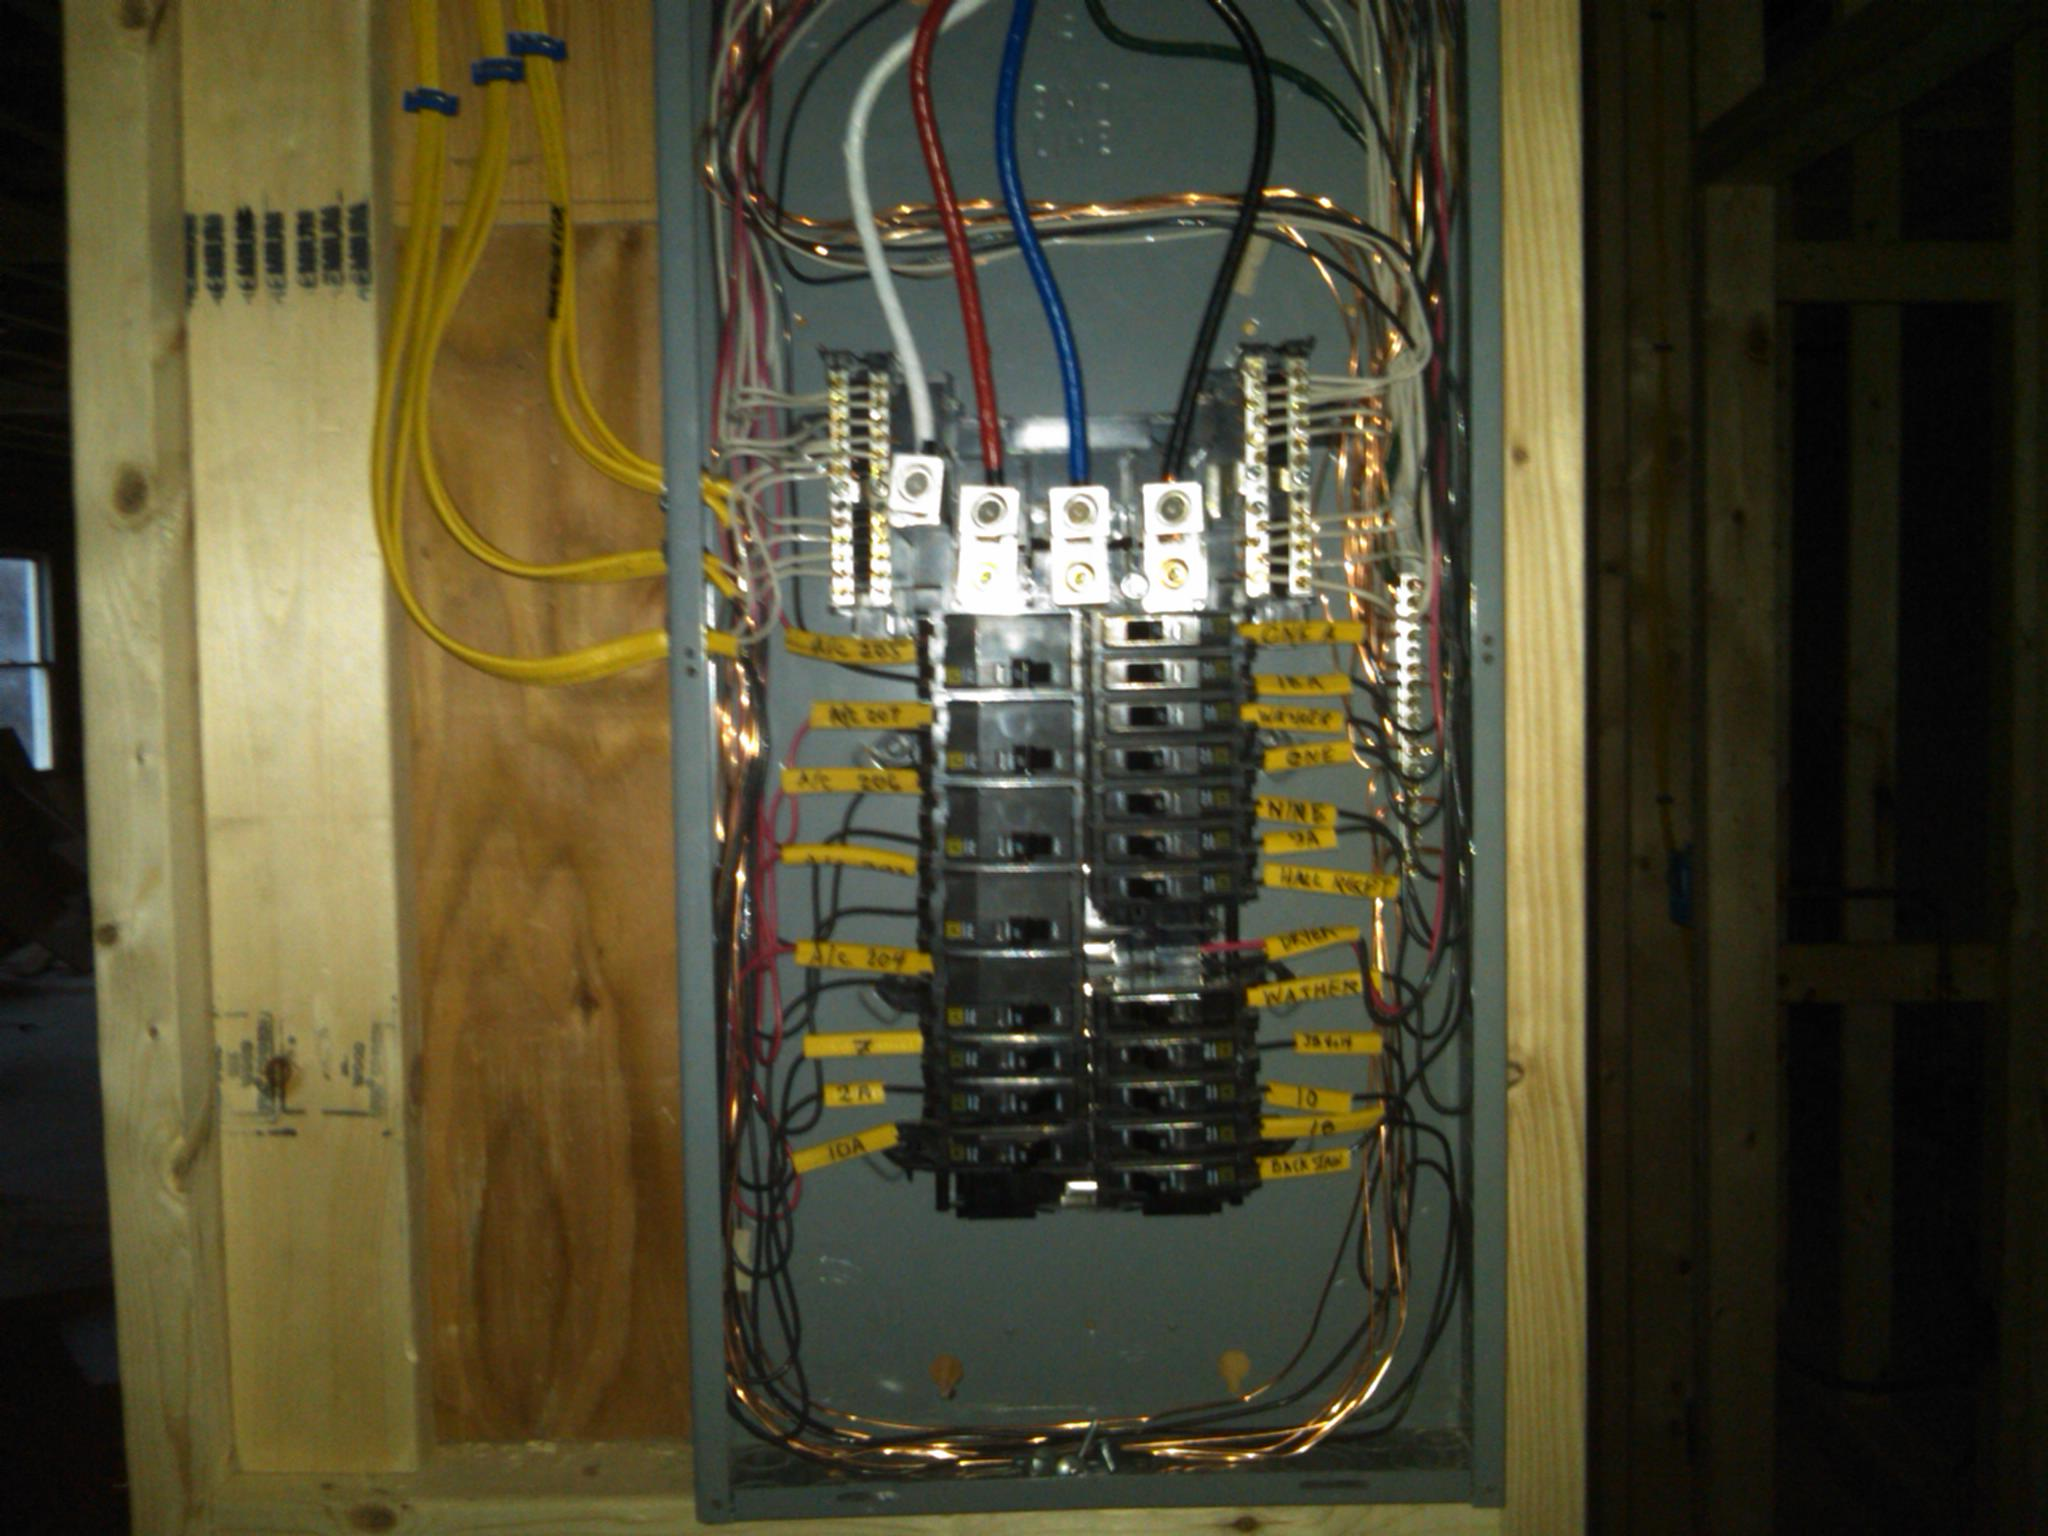 More Panel installation